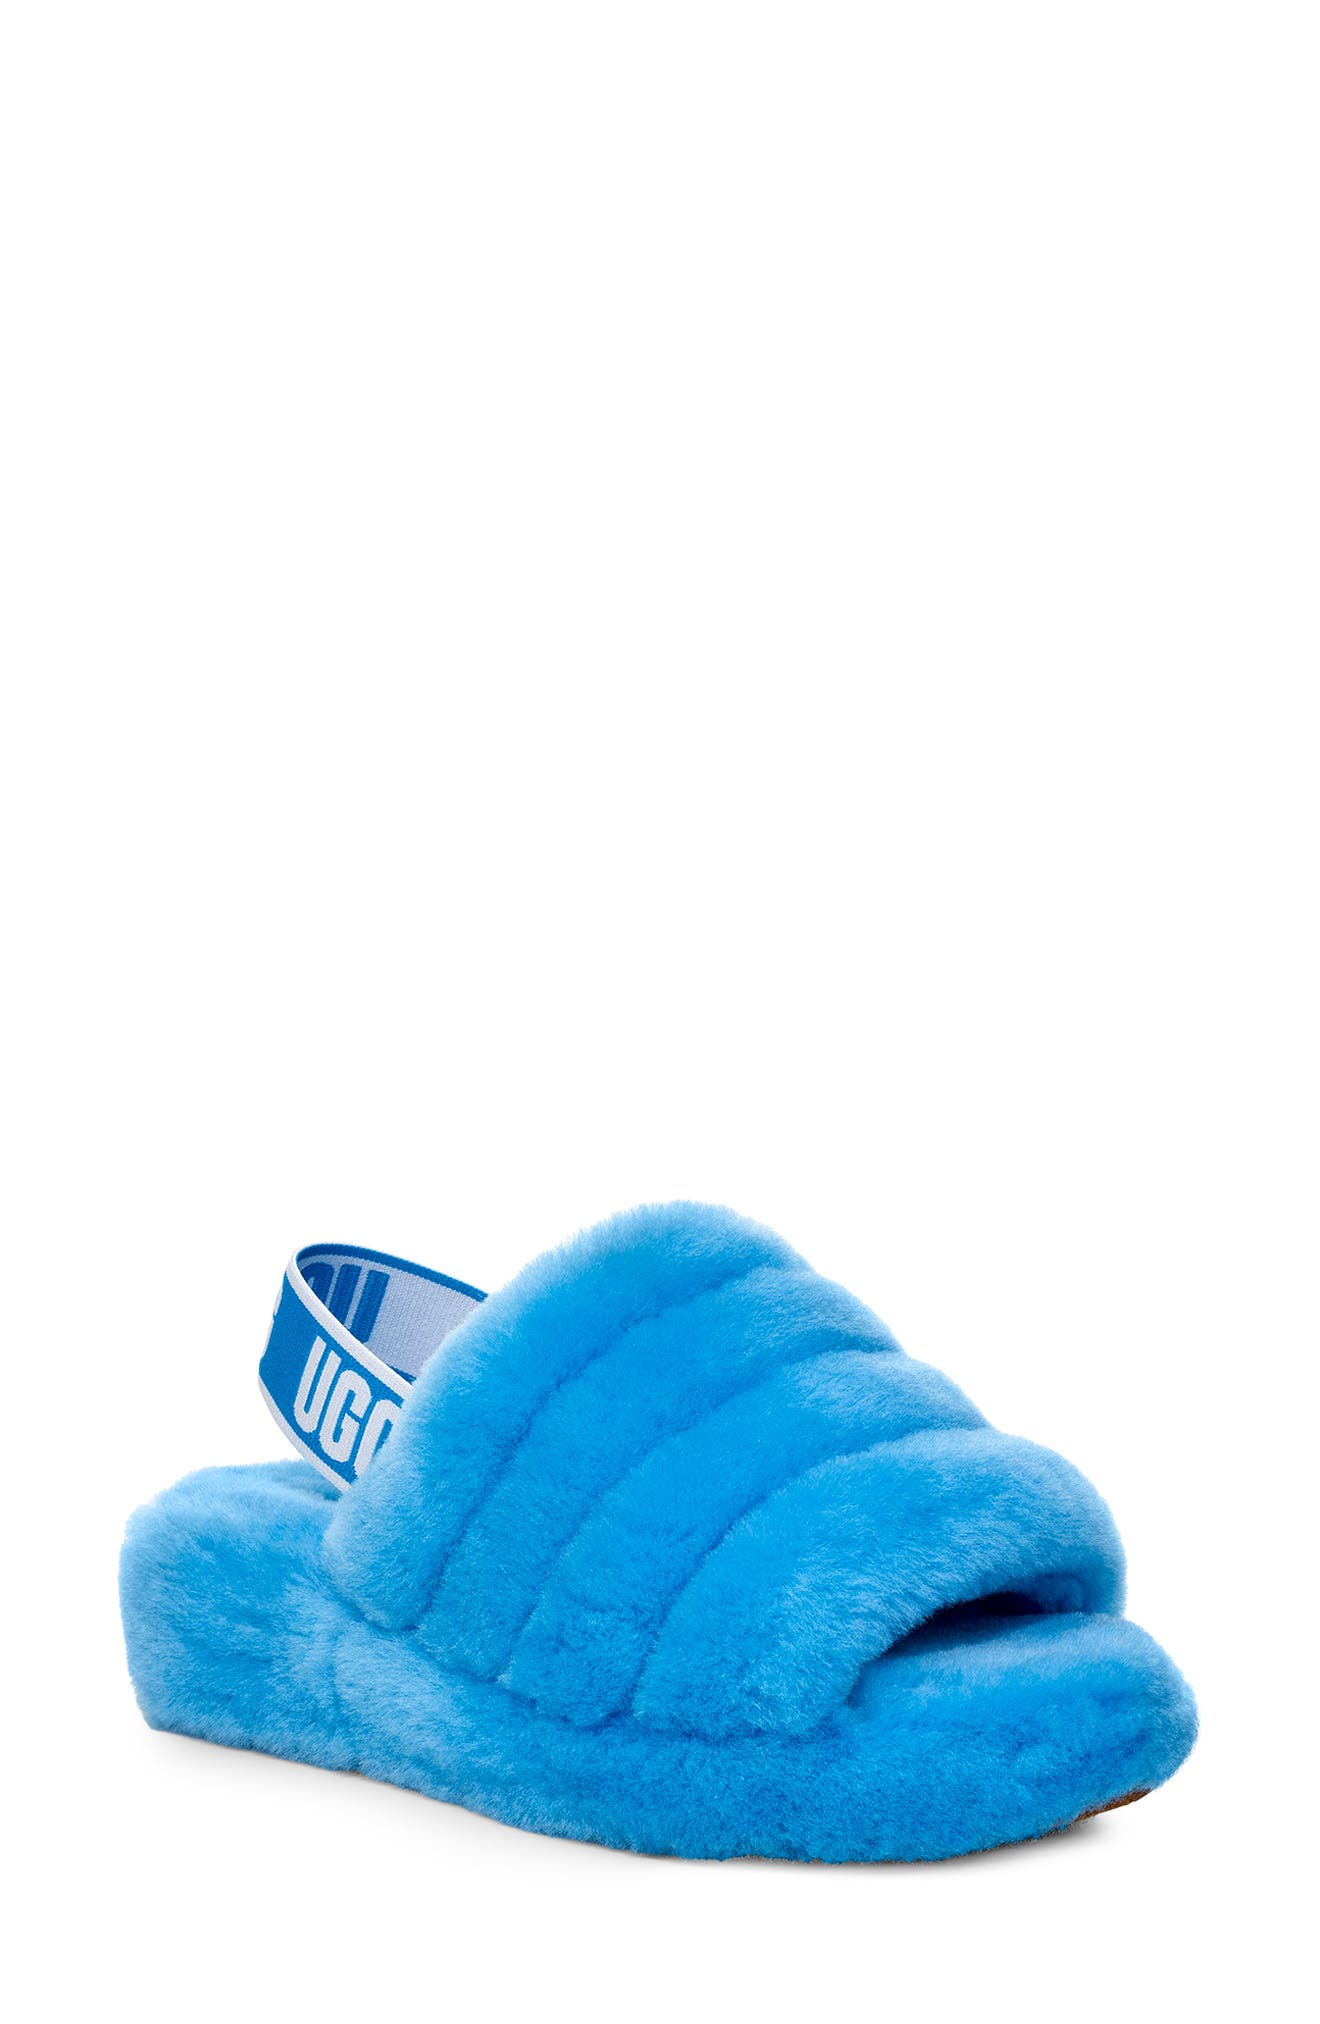 Ugg Fluff Yeah Genuine Shearling Slipper, Blue